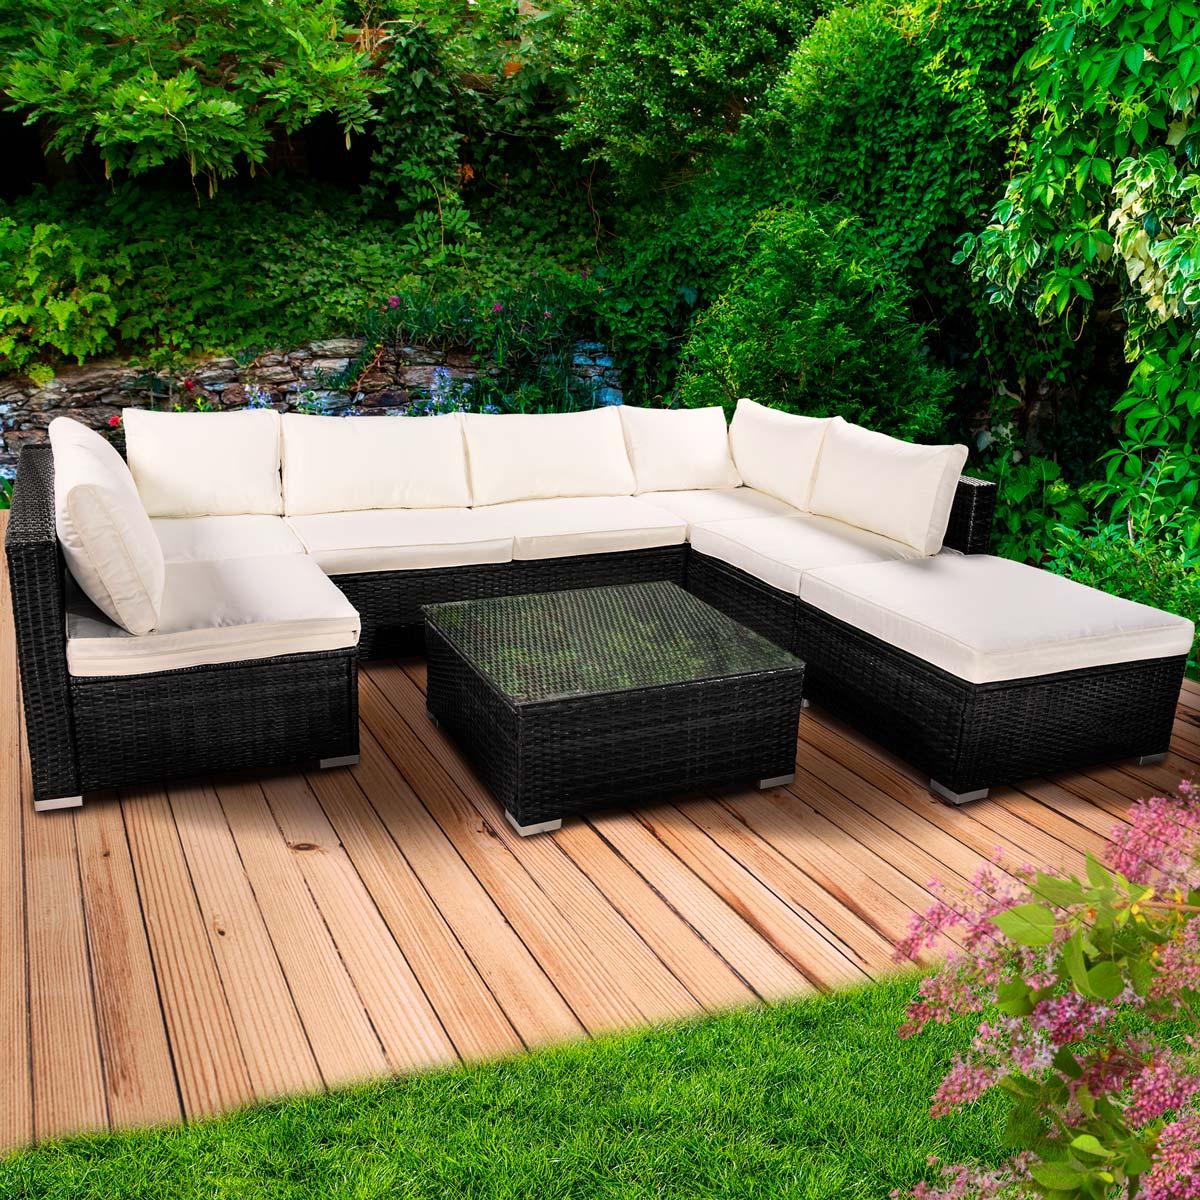 poly rattan gartenm bel lounge m bel sitzgarnitur gartengarnitur sitzgruppe sofa ebay. Black Bedroom Furniture Sets. Home Design Ideas